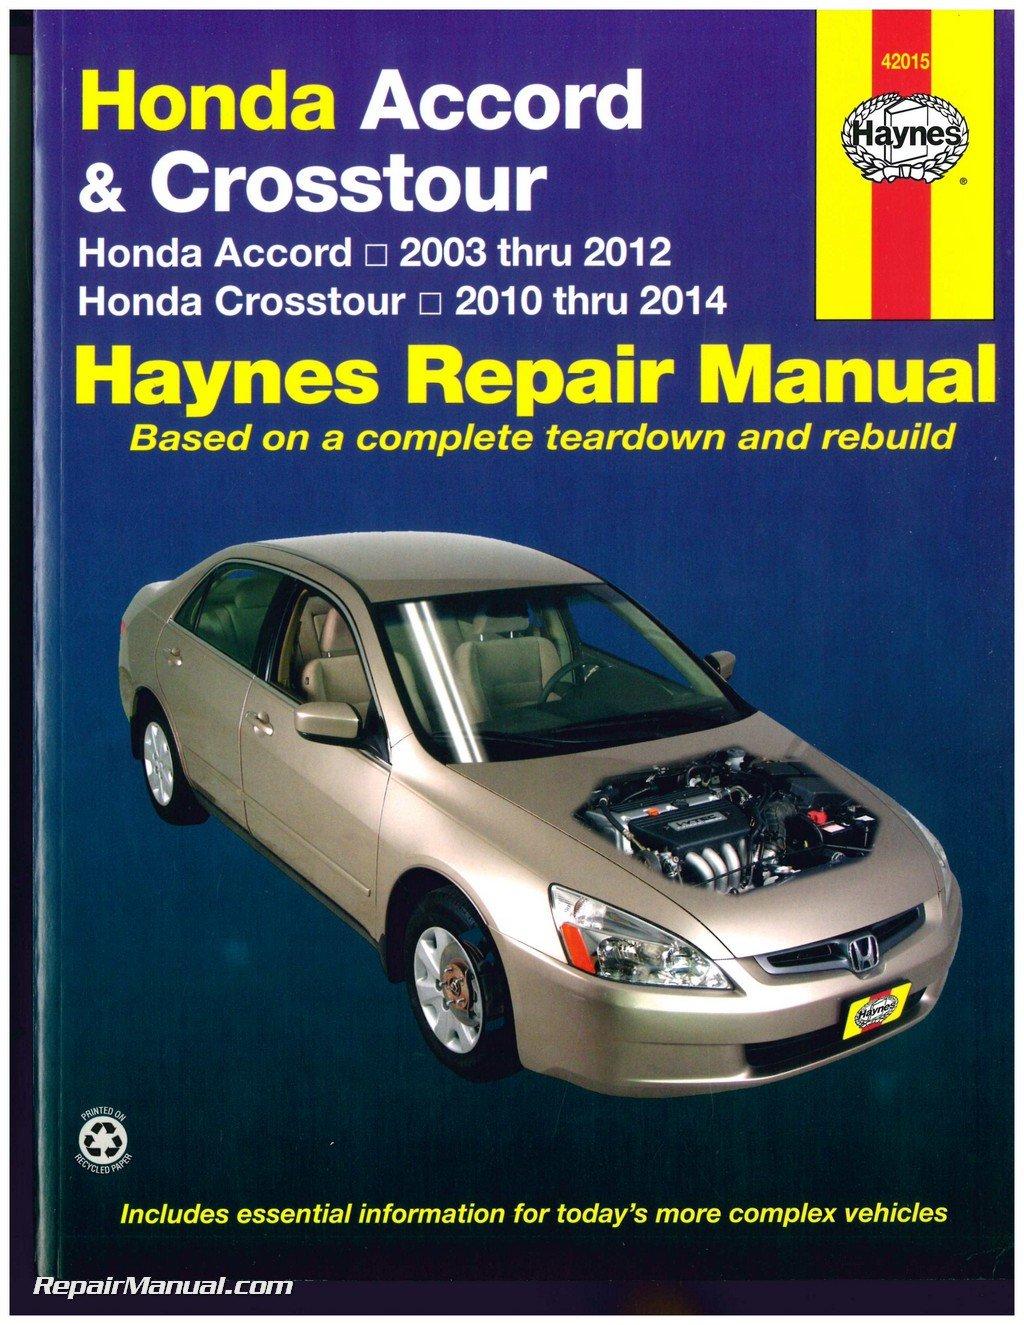 h42015 honda accord 2003 2012 crosstour 2010 2014 haynes automotive rh amazon com 2004 honda accord repair manual pdf 2004 honda accord repair manual free download